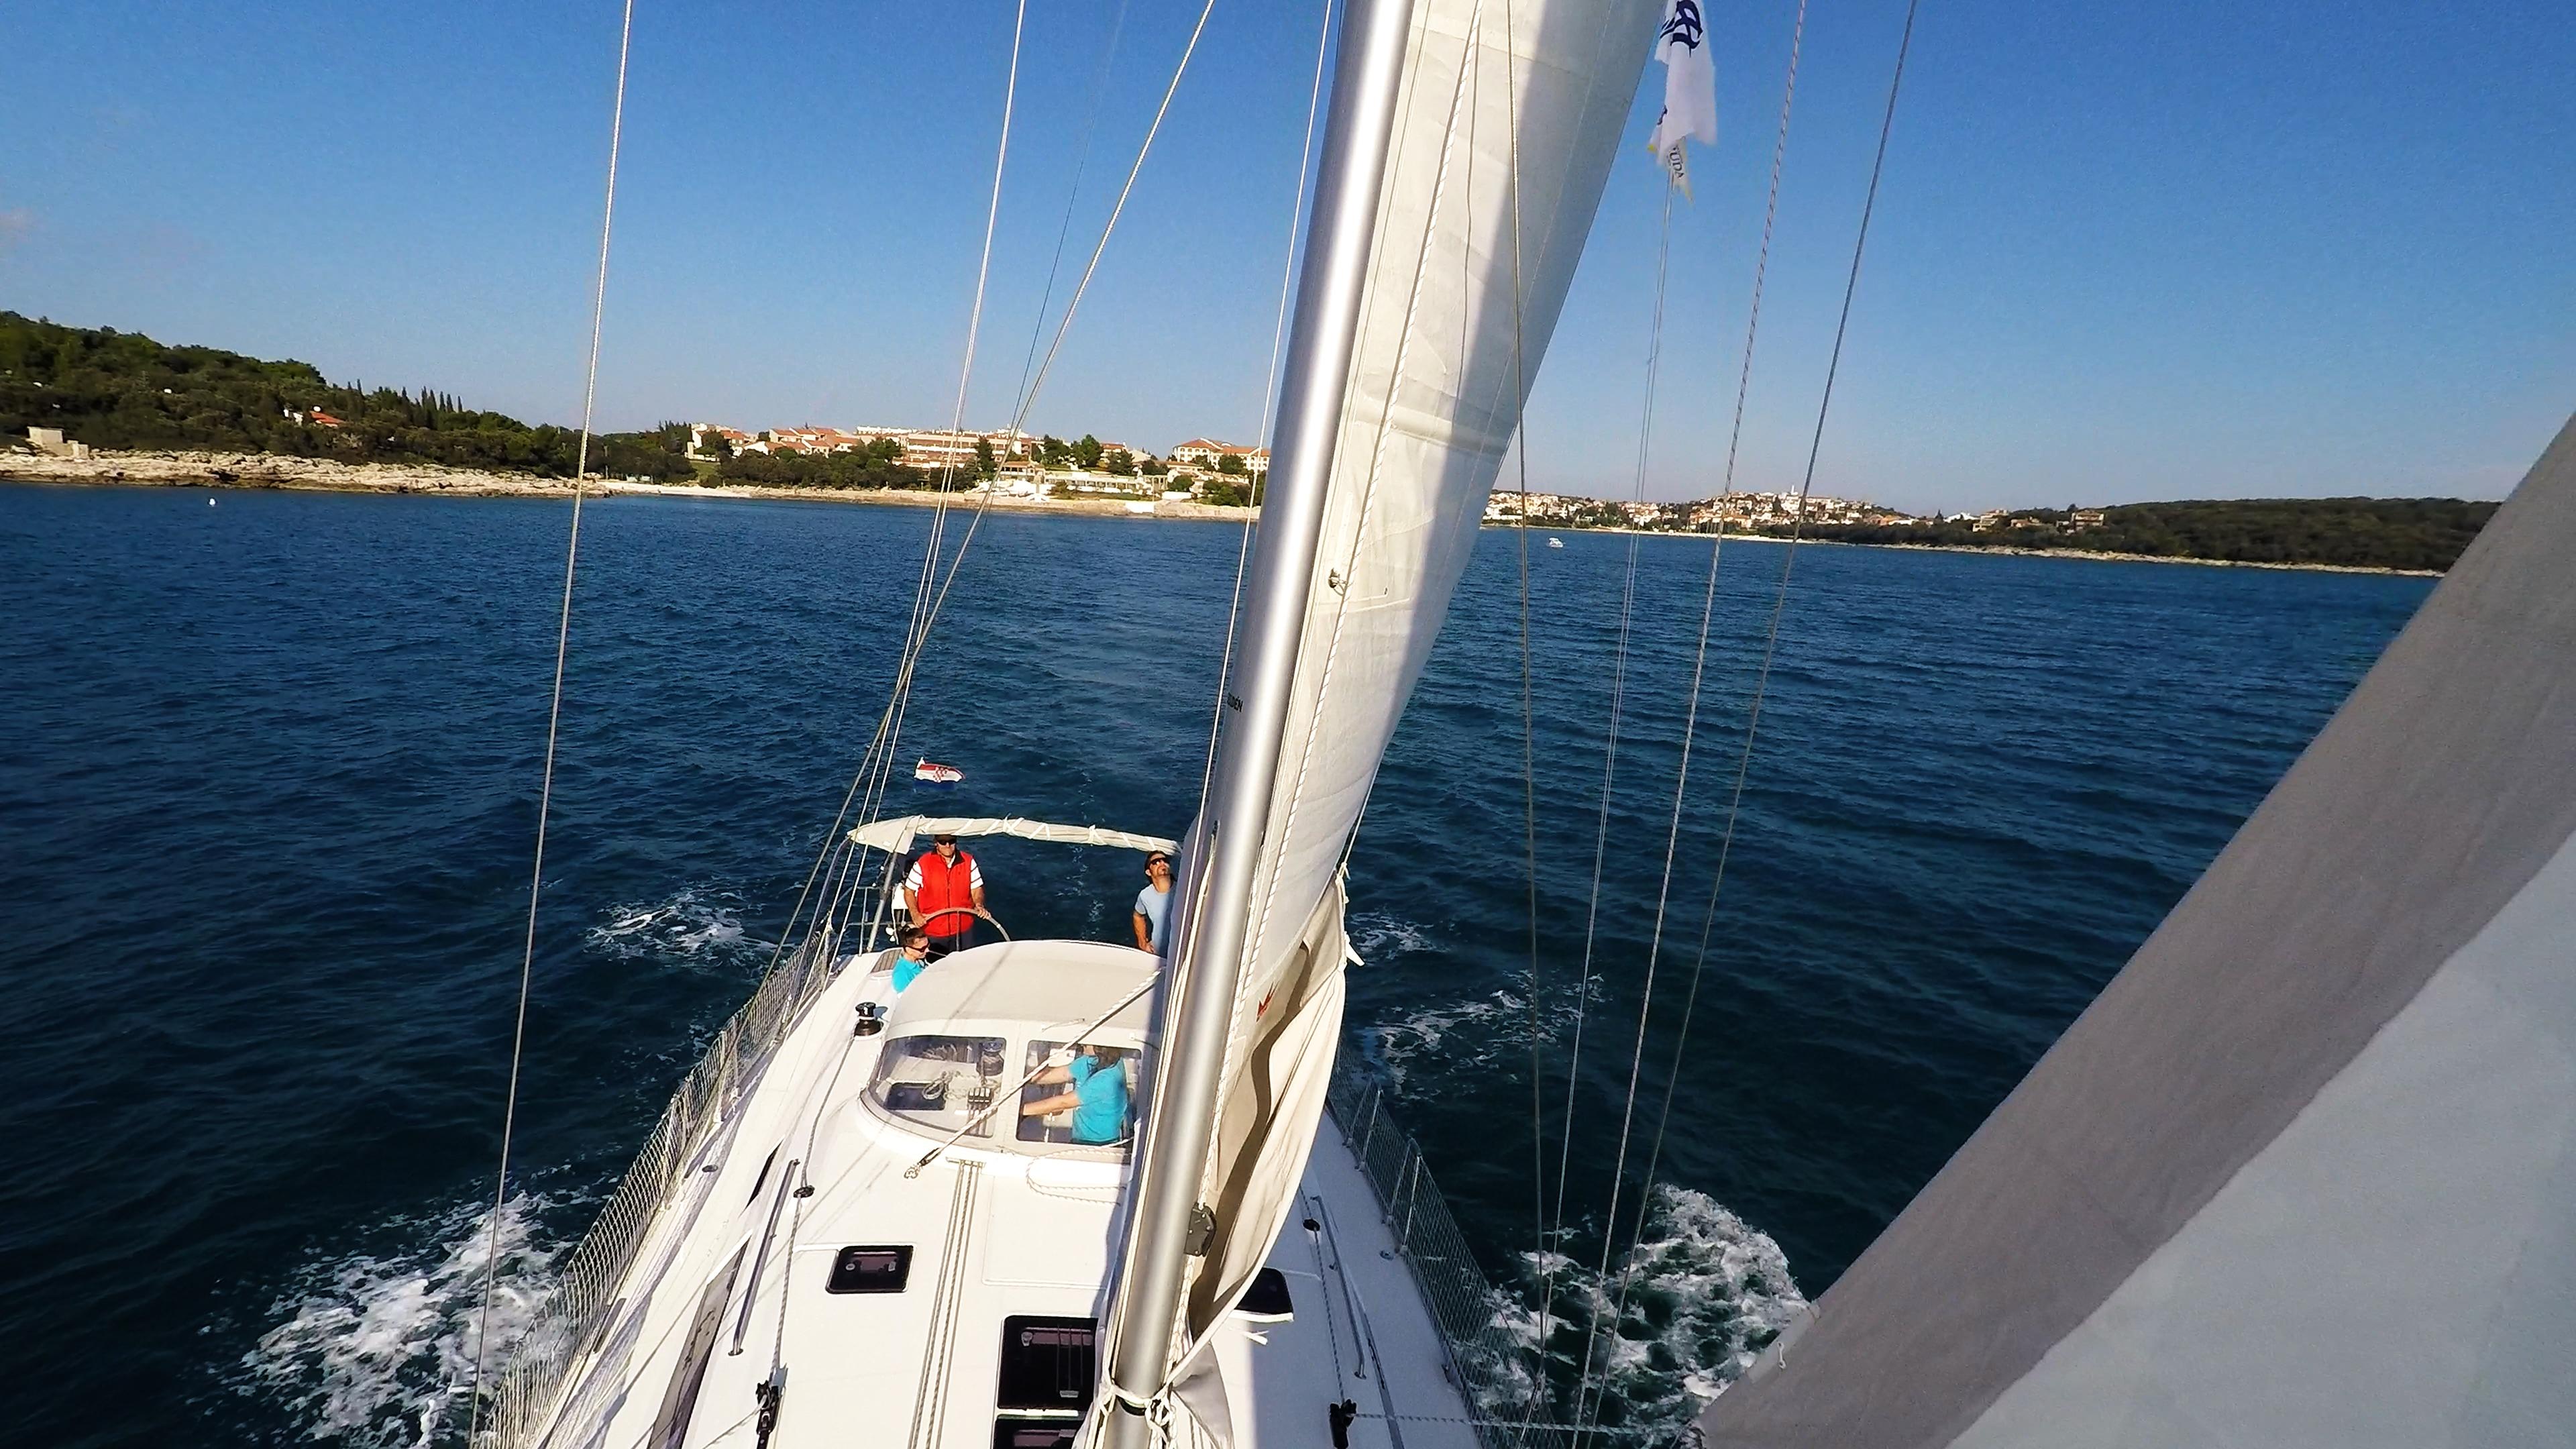 sailing yacht sailboat mast rigging shrouds sails deck